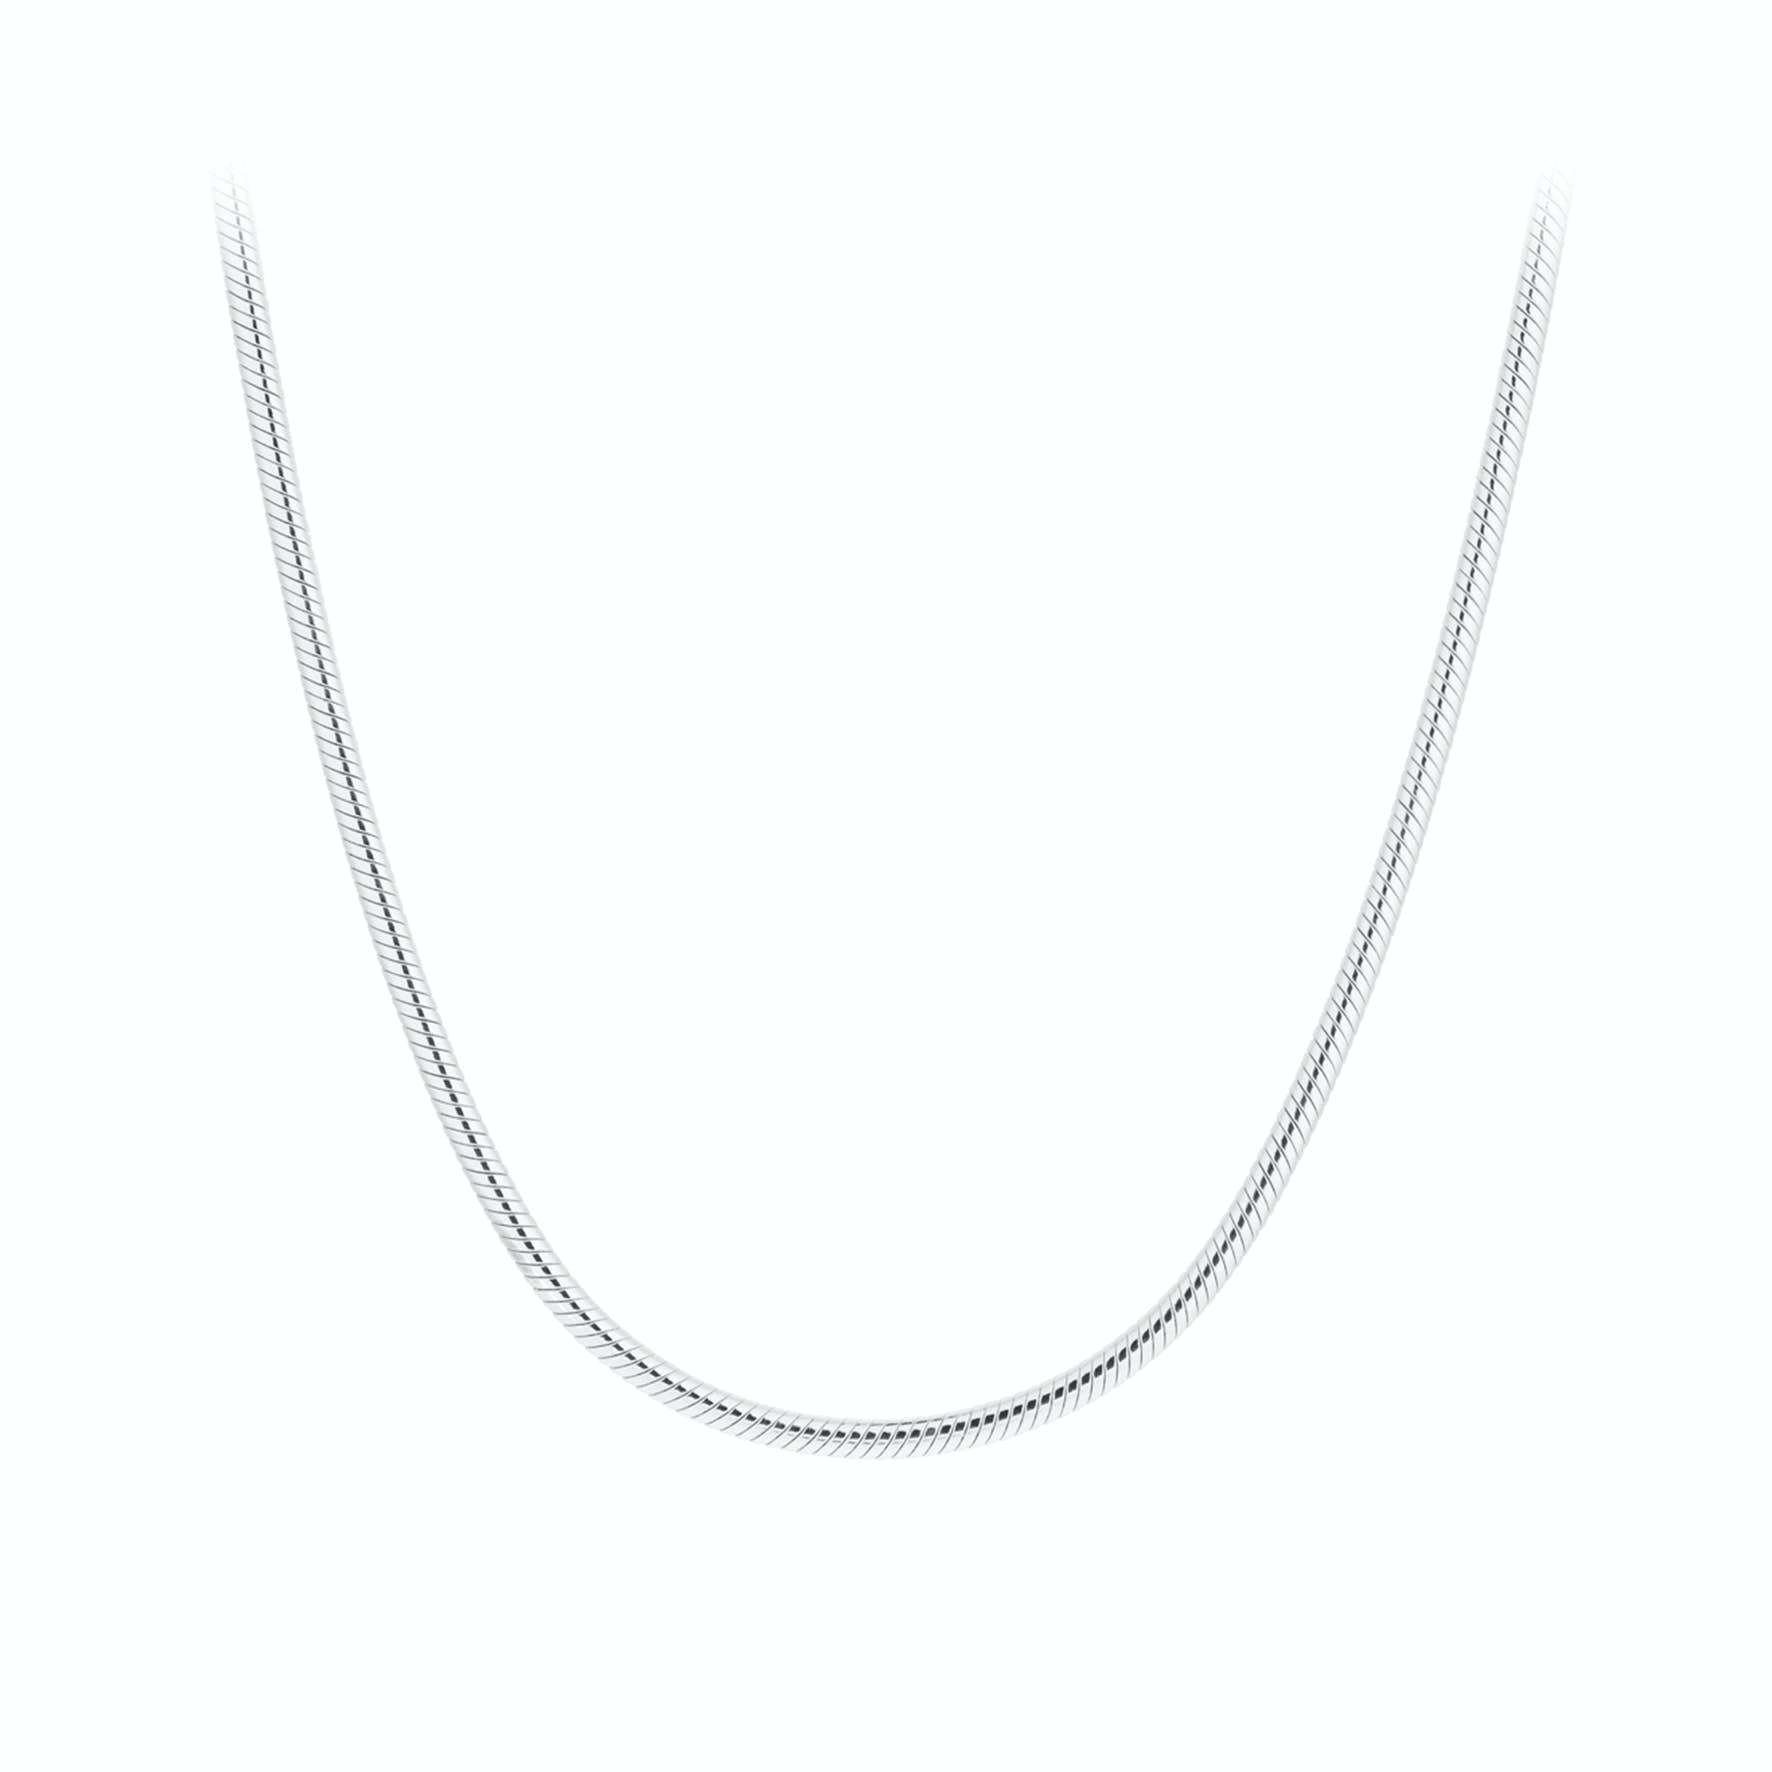 Snake Necklace von Pernille Corydon in Silber Sterling 925